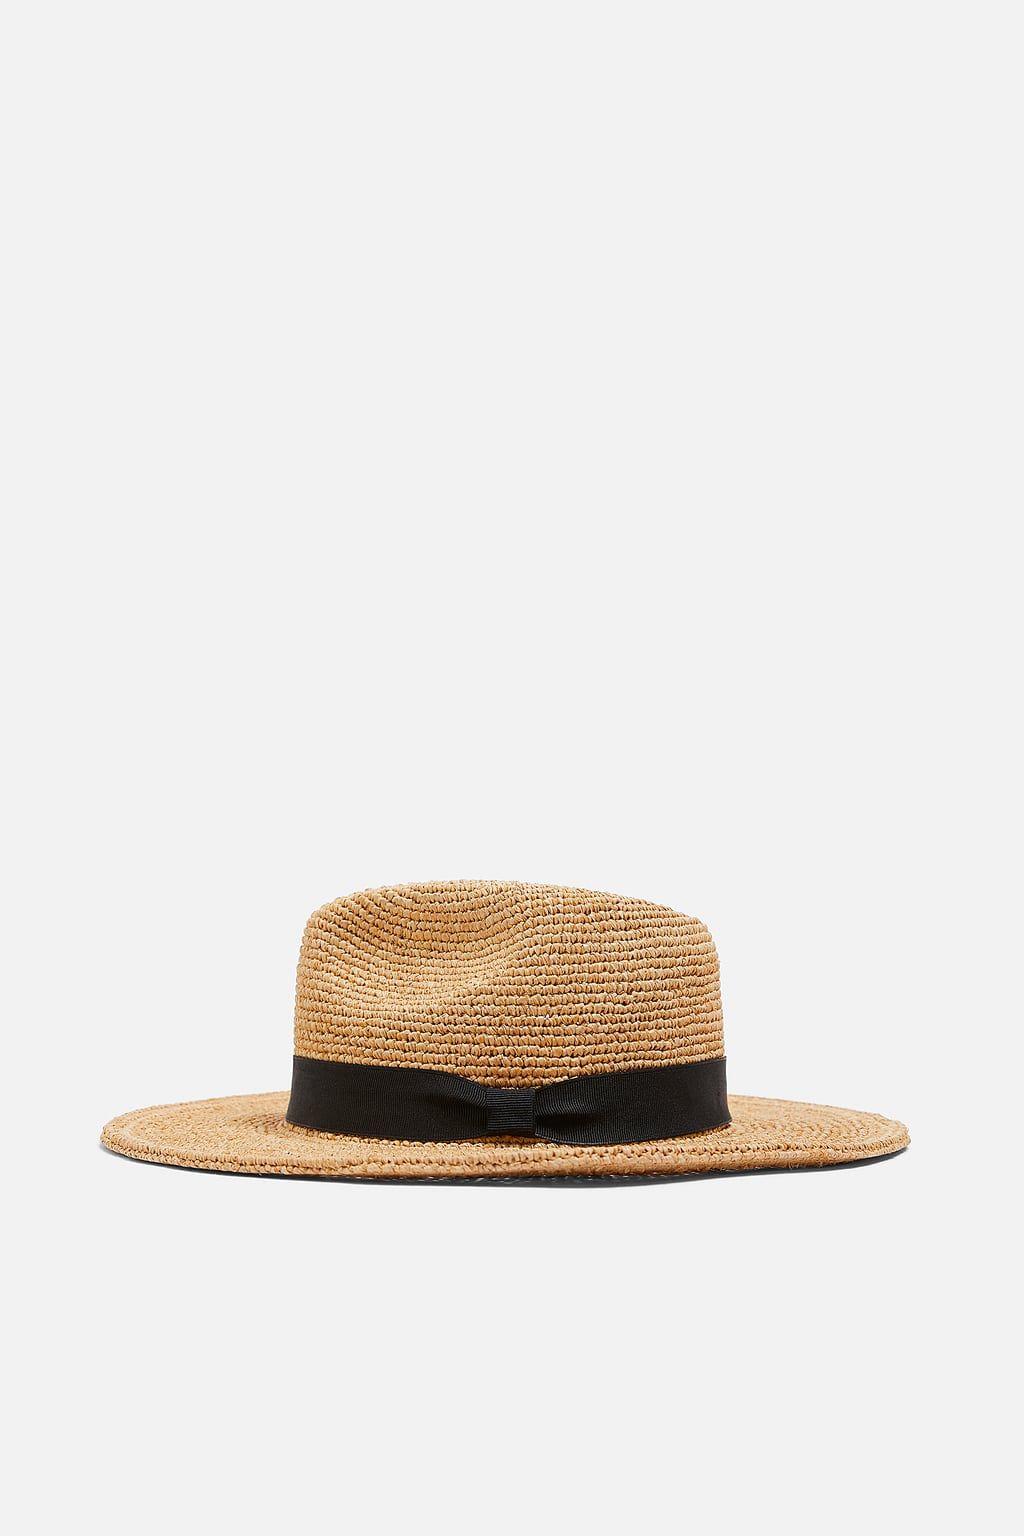 Large Brimmed Hat Hats Beanies Accessories Woman Zara United States Complementos Para El Pelo Sombreros Online Zara